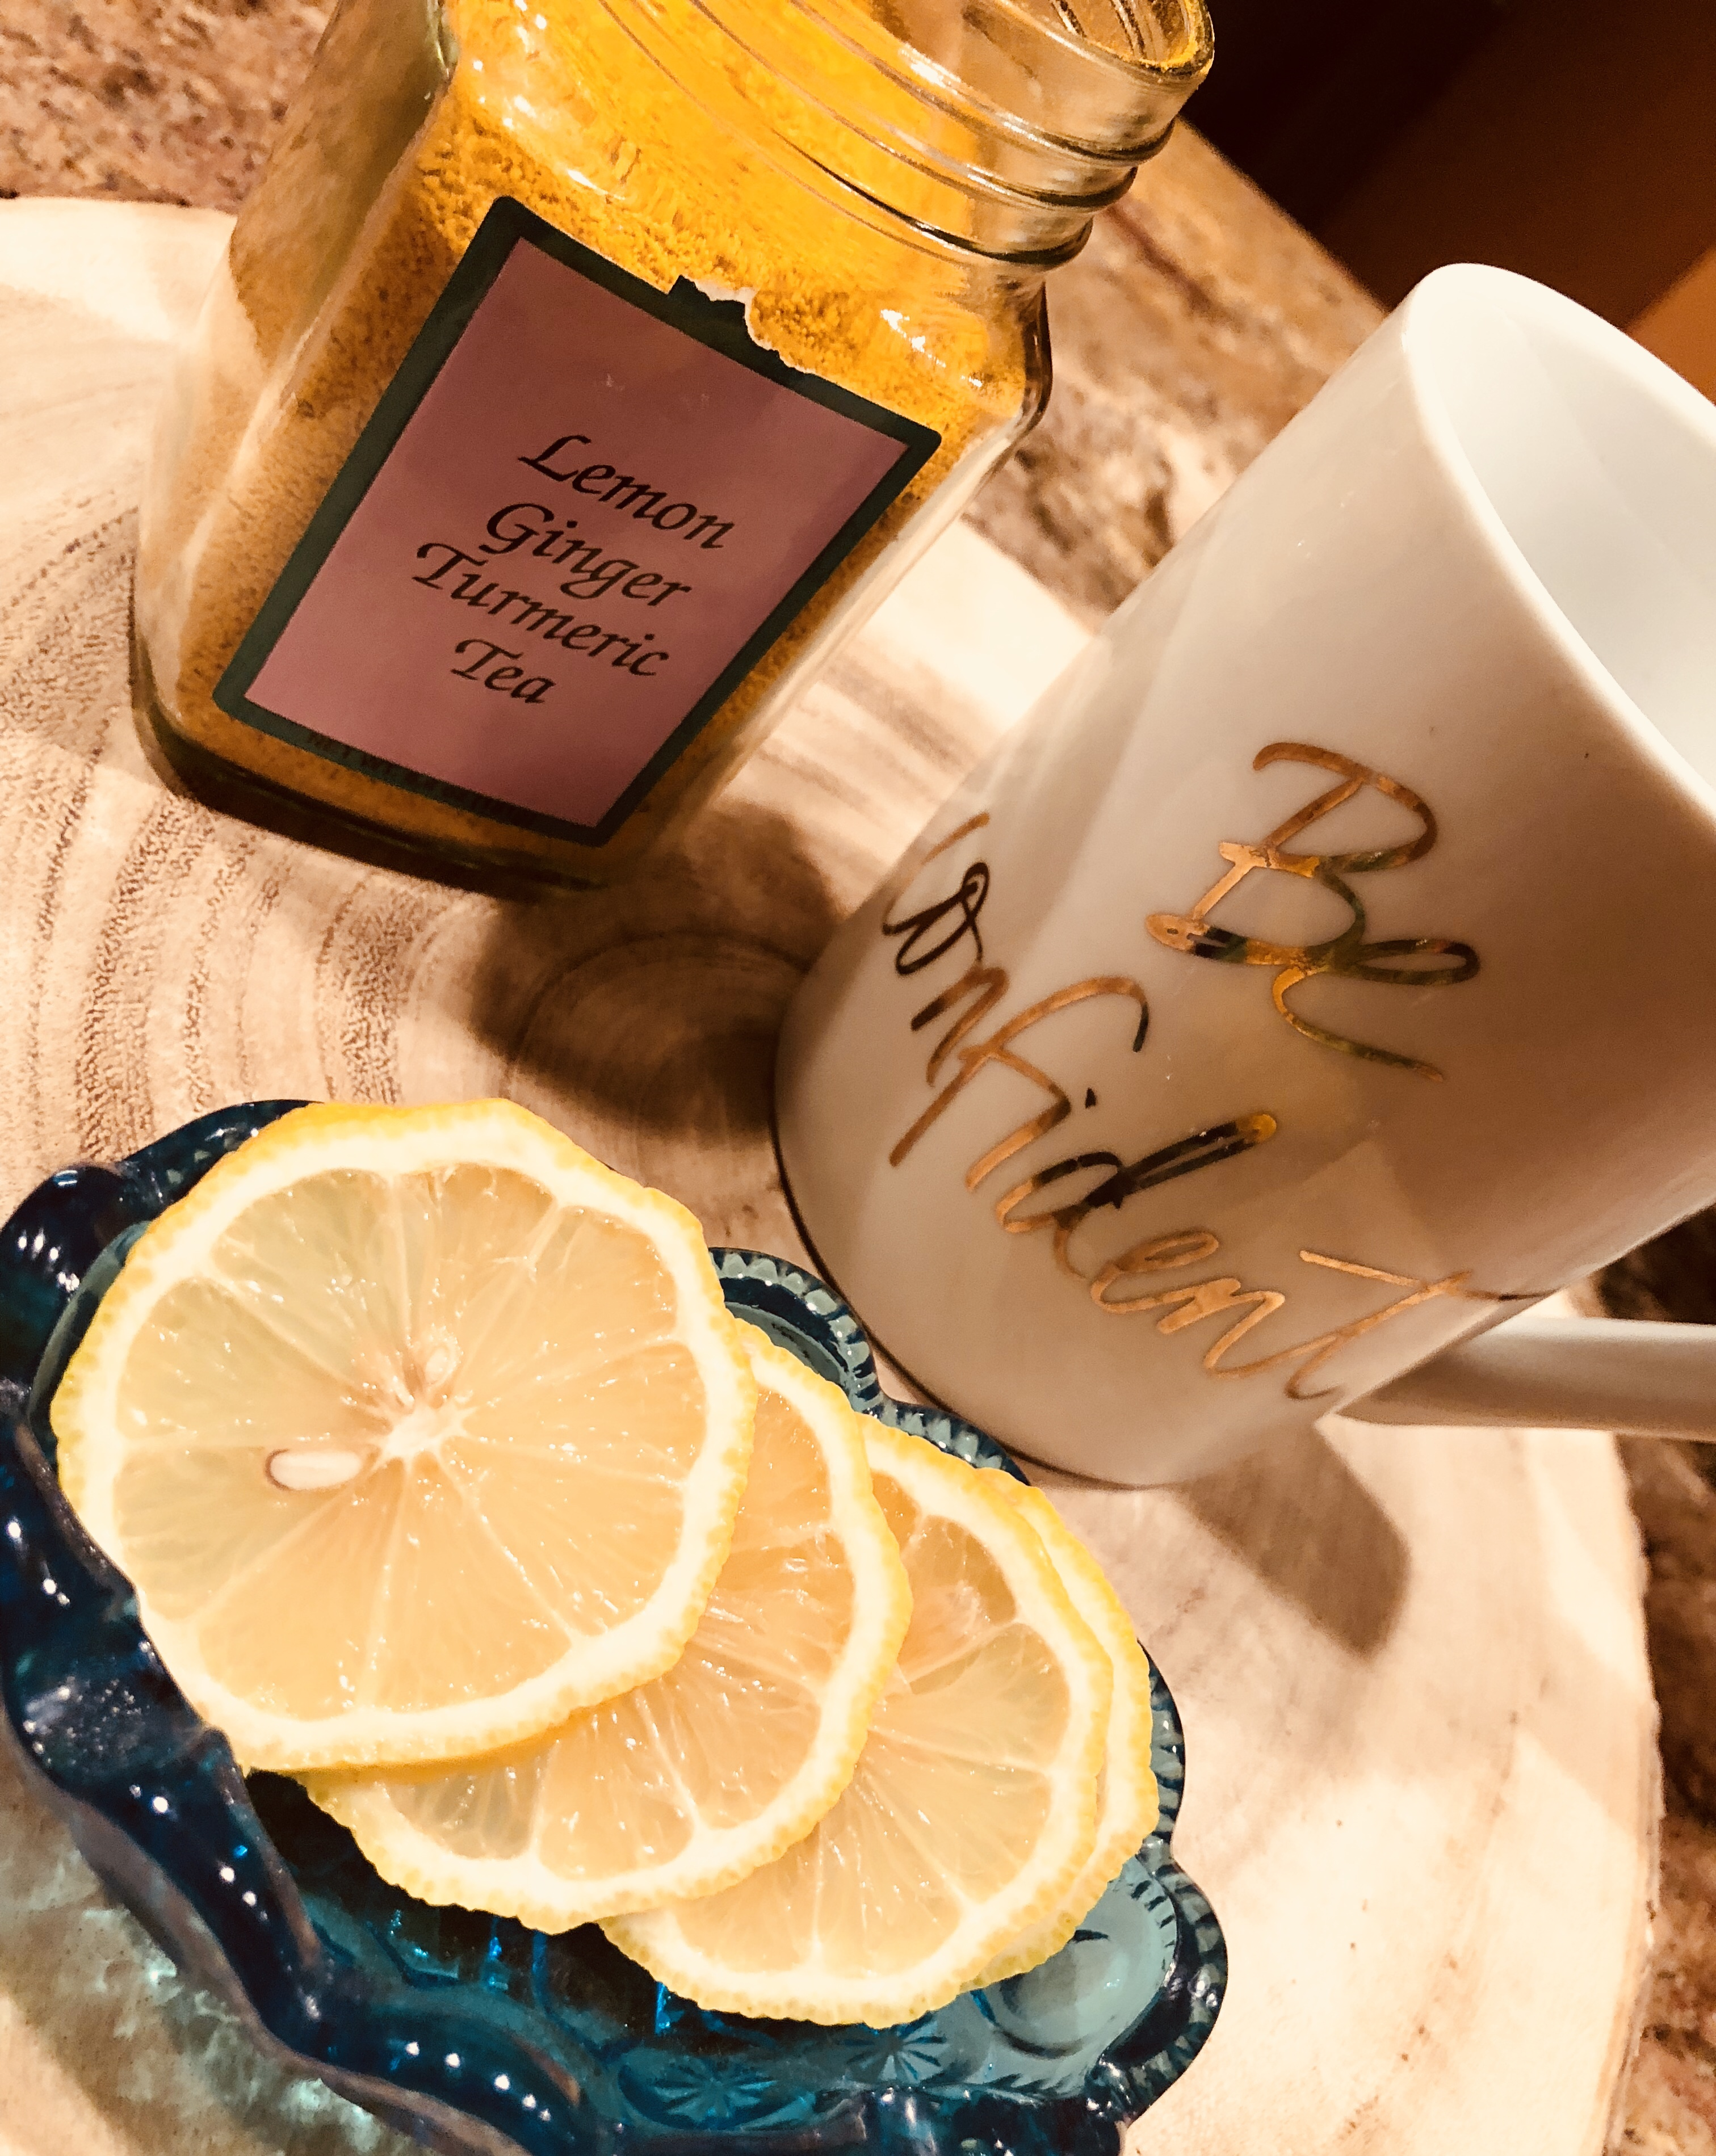 Lemon Ginger Turmeric Tea – cjBlue Creative Studios